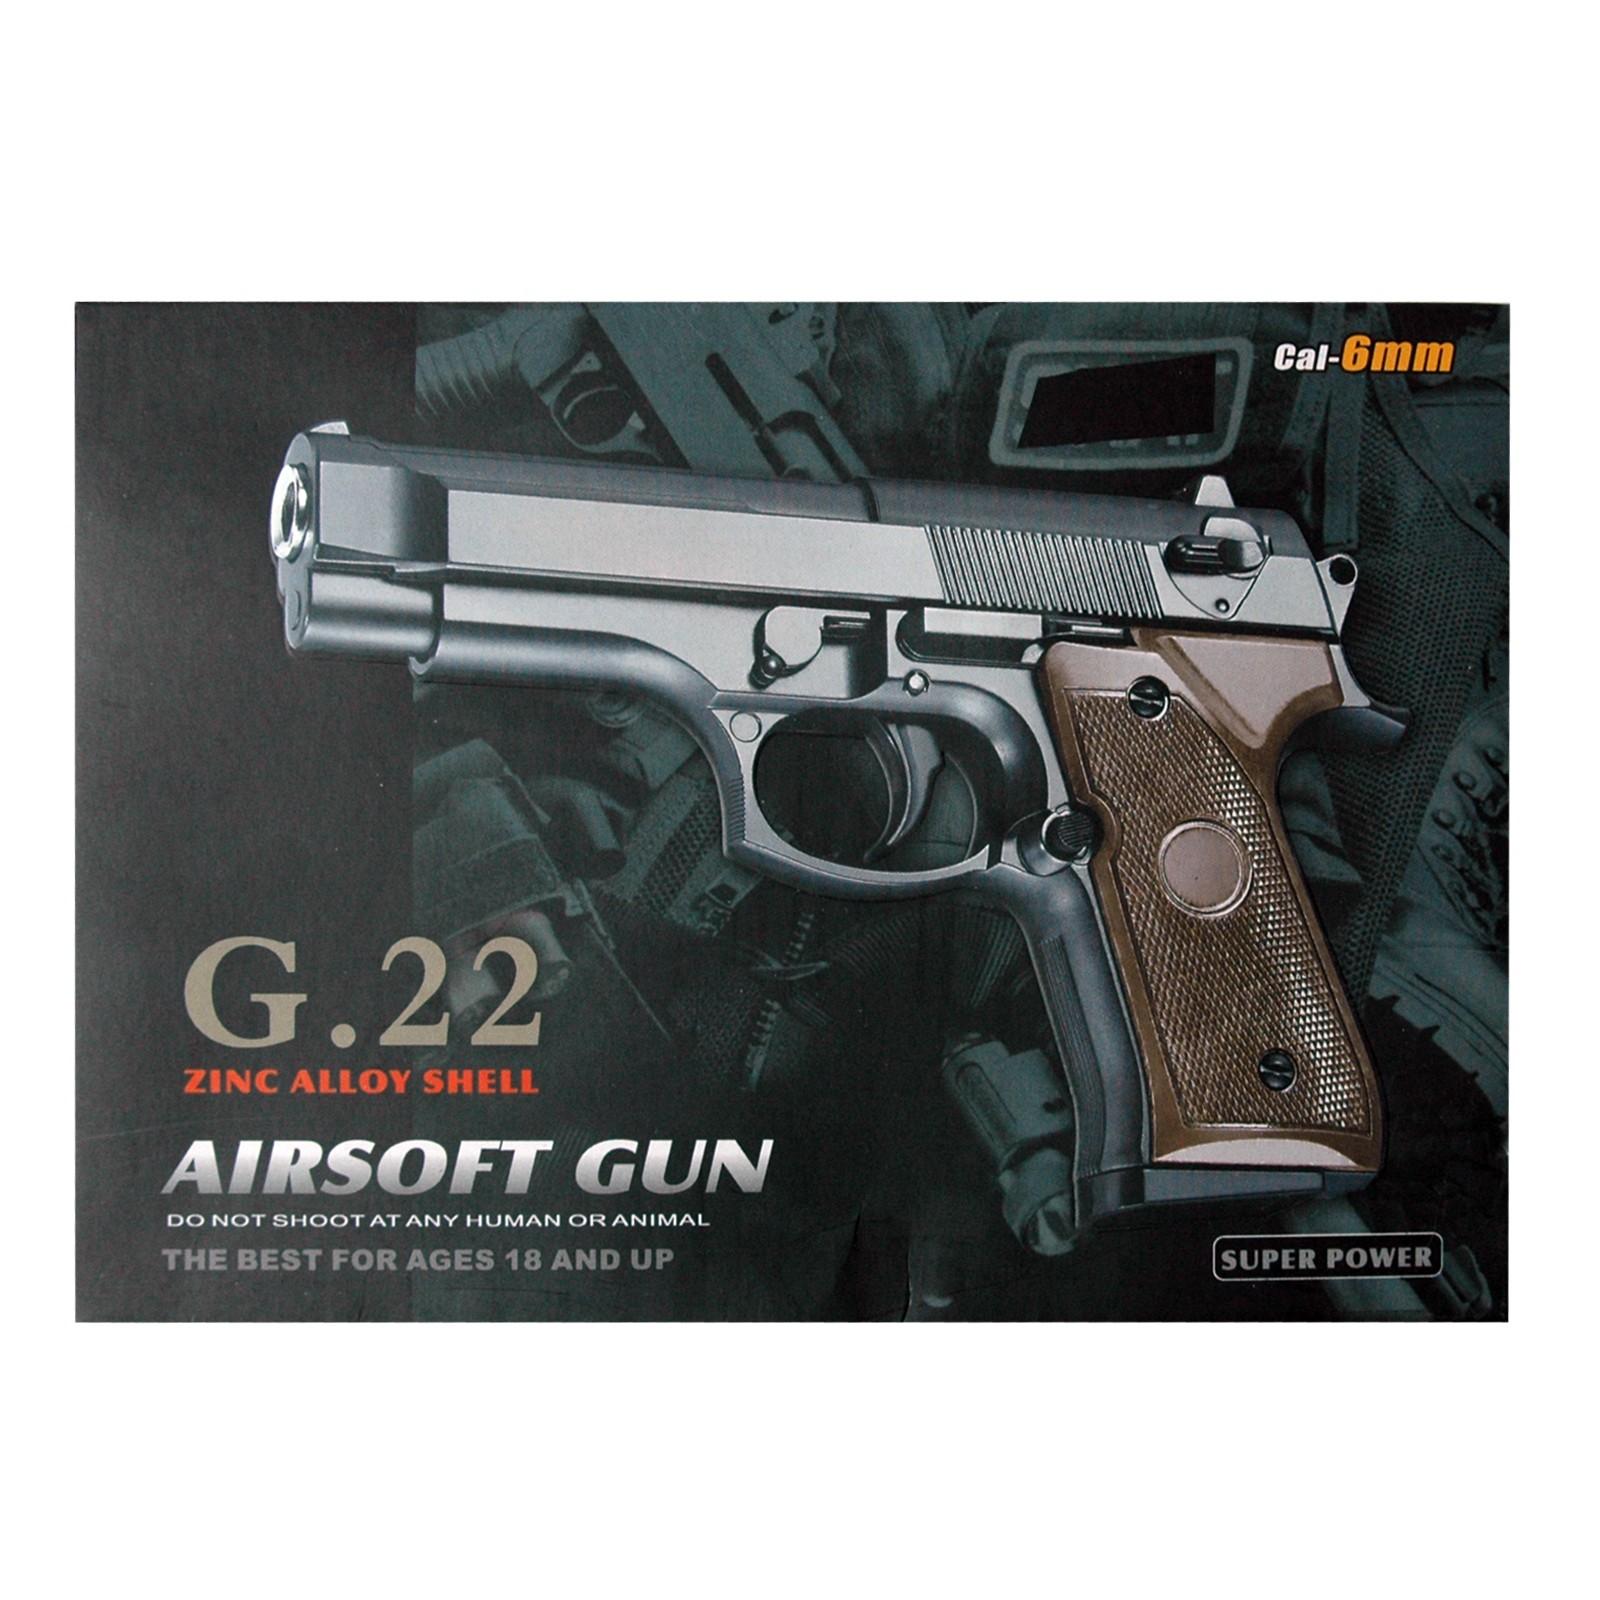 Softair Pistole G22, aus Metall, Kaliber 6mm, Federdruck